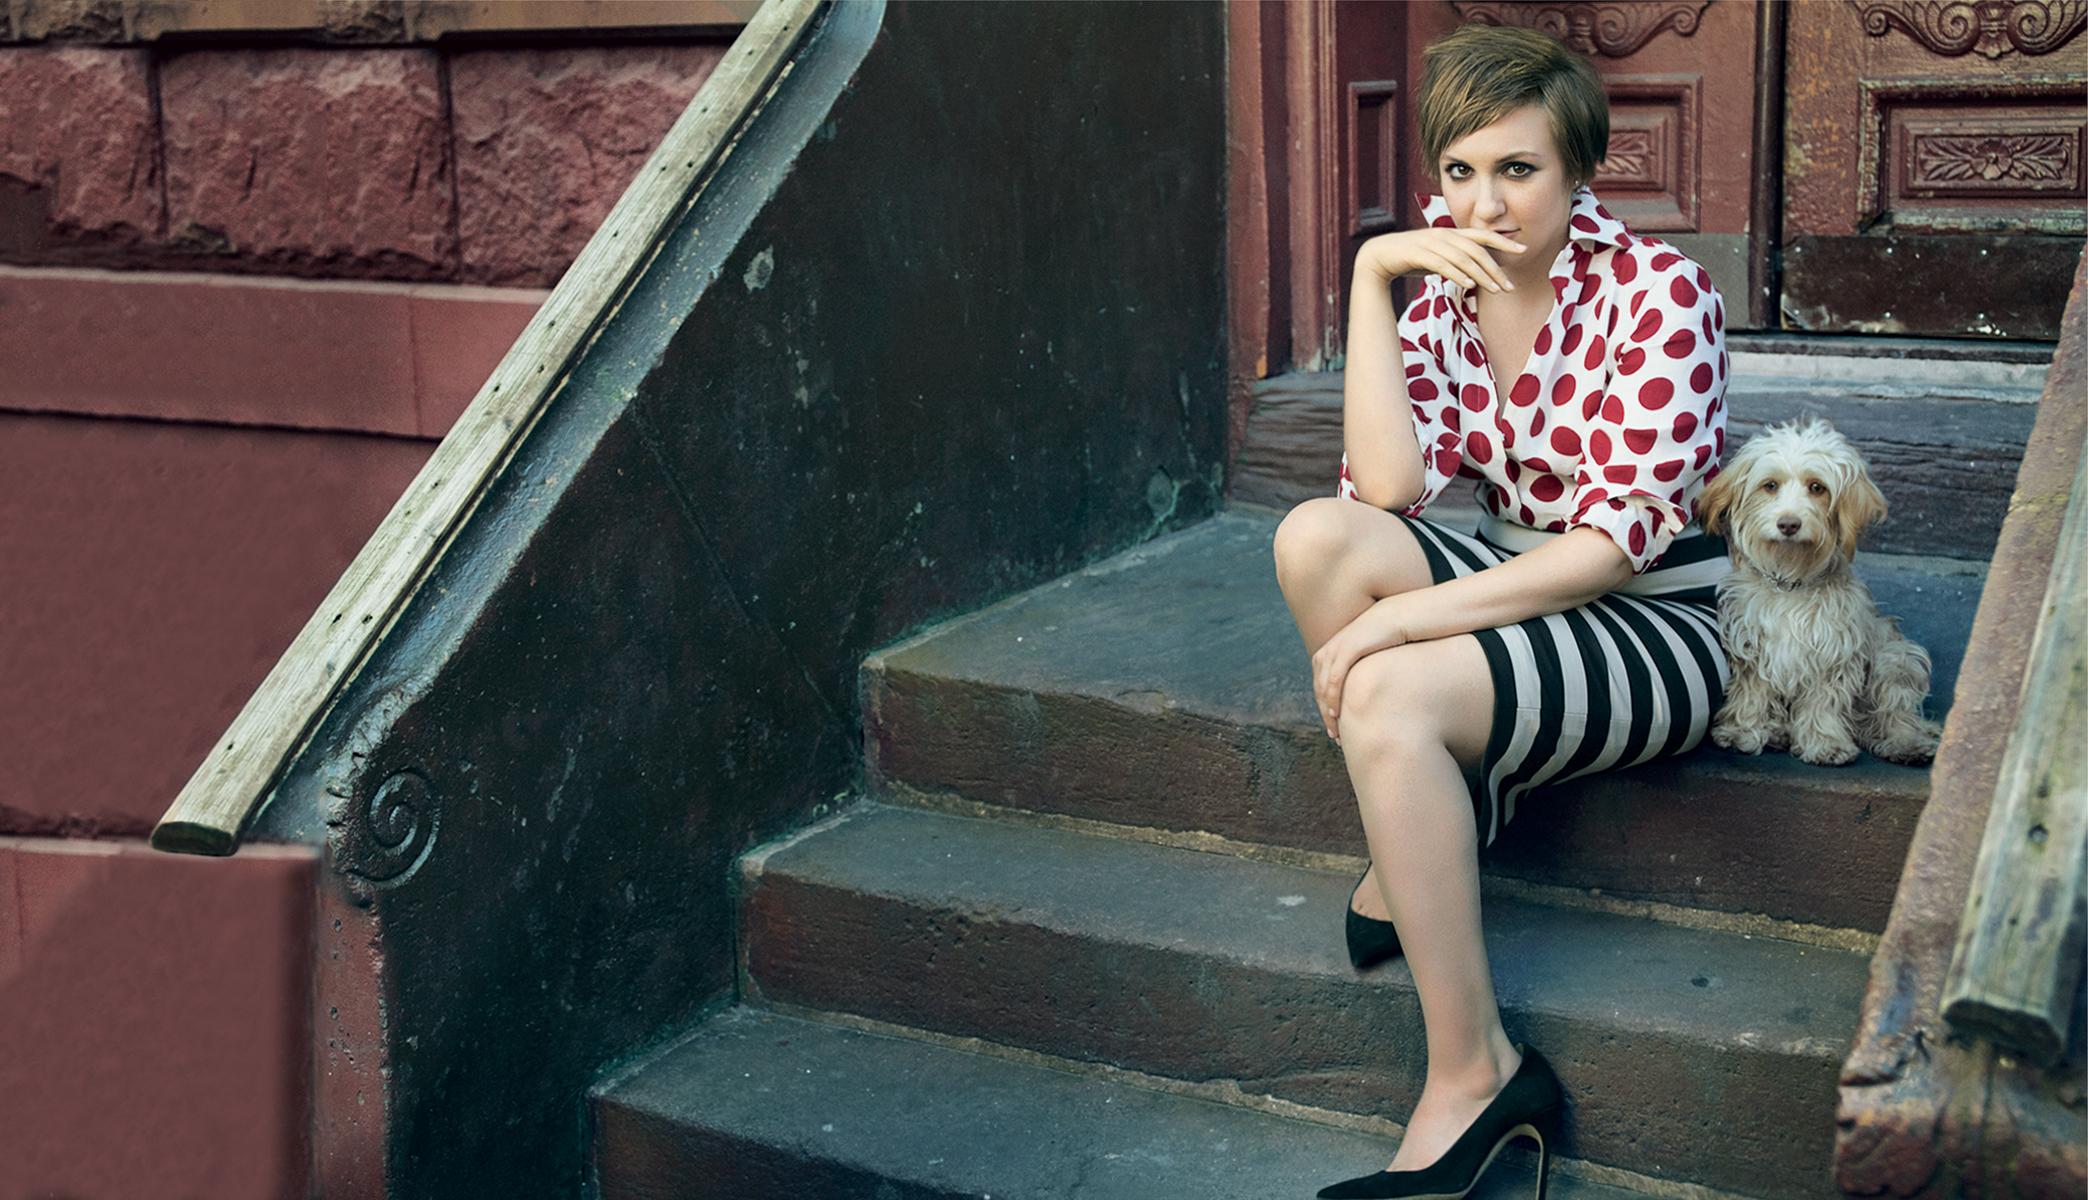 Lena Dunham Explains Her Passion For Reproductive Choice